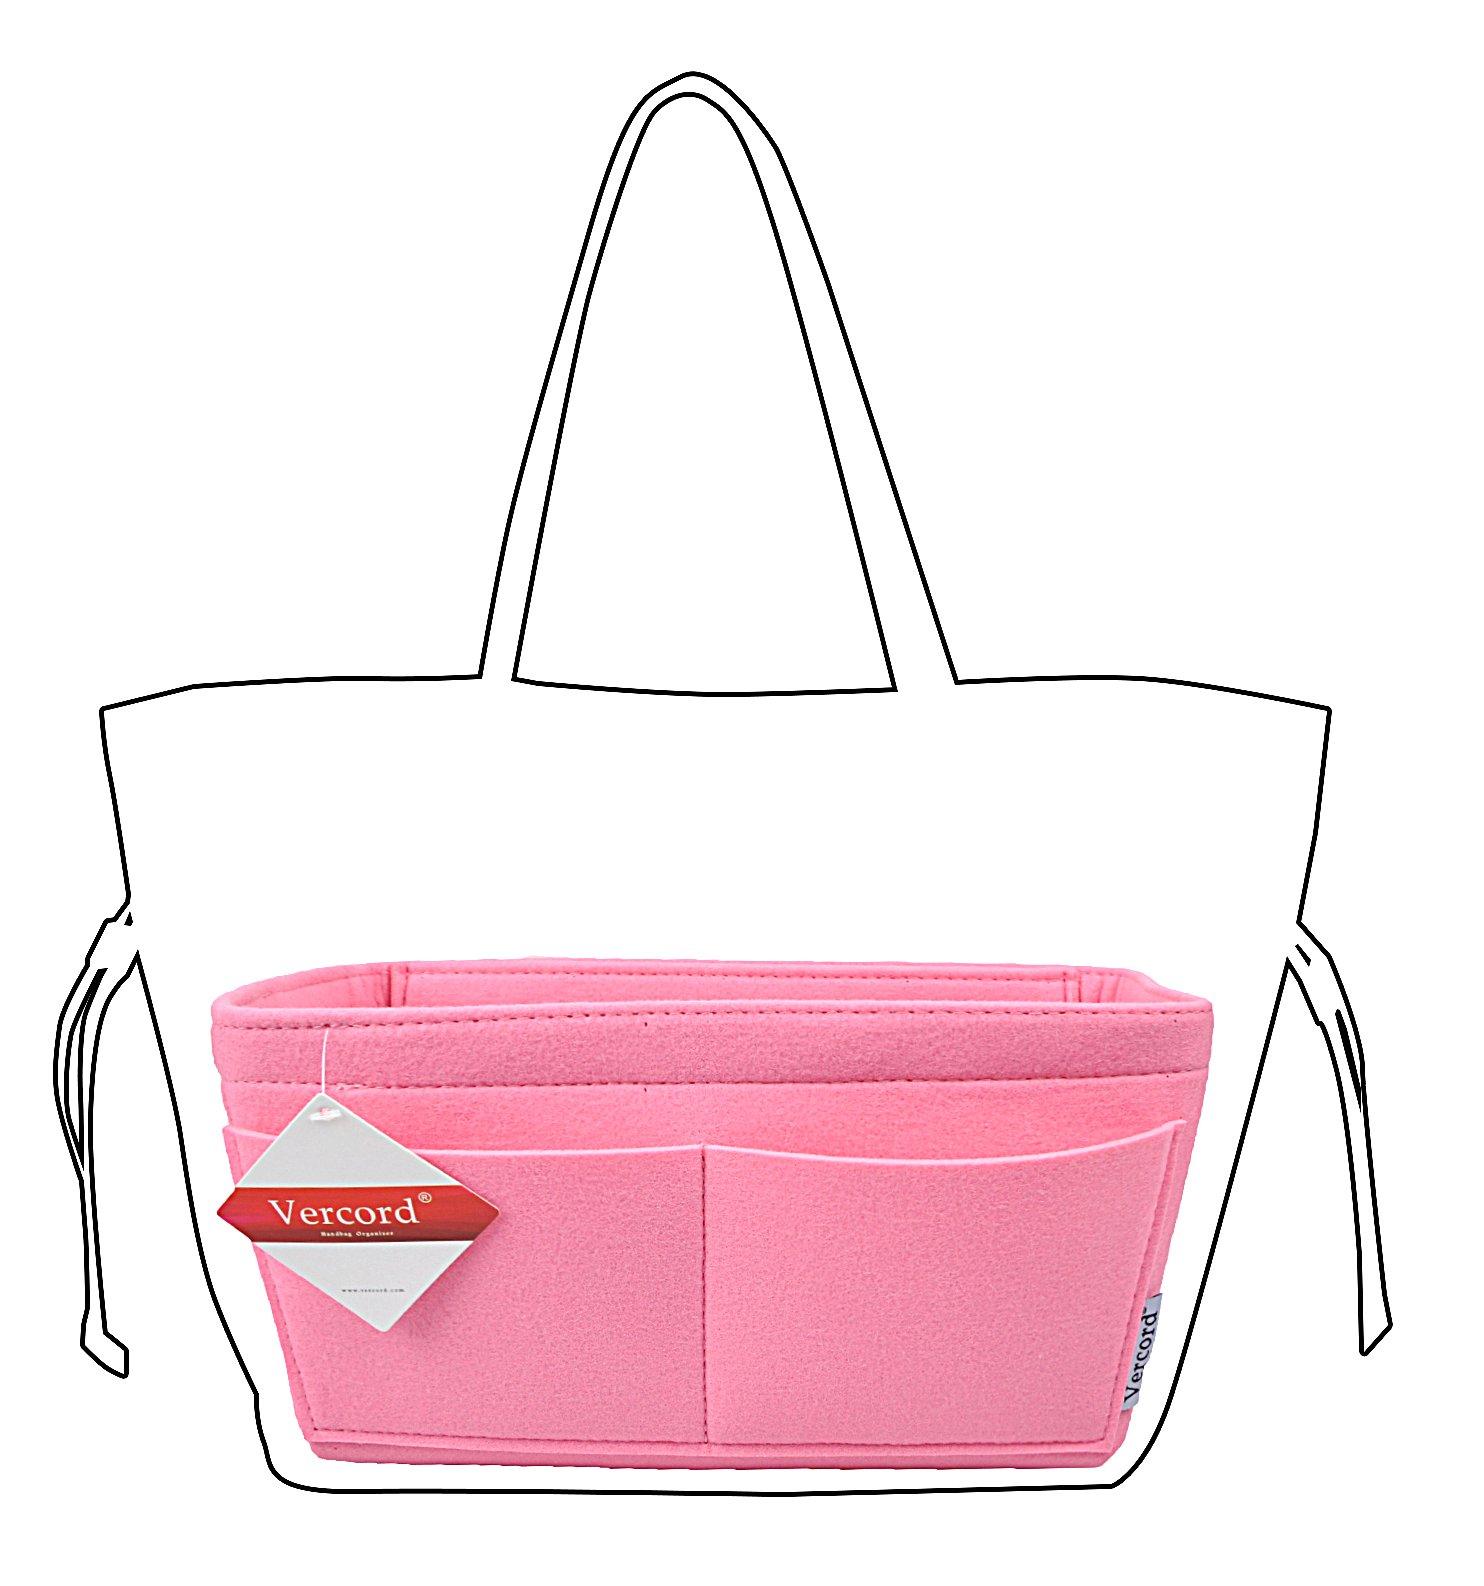 Felt Handbag organizer,Insert Purse Organizer 10 Pockets Structure Shaper 2 Size (M, Pink)